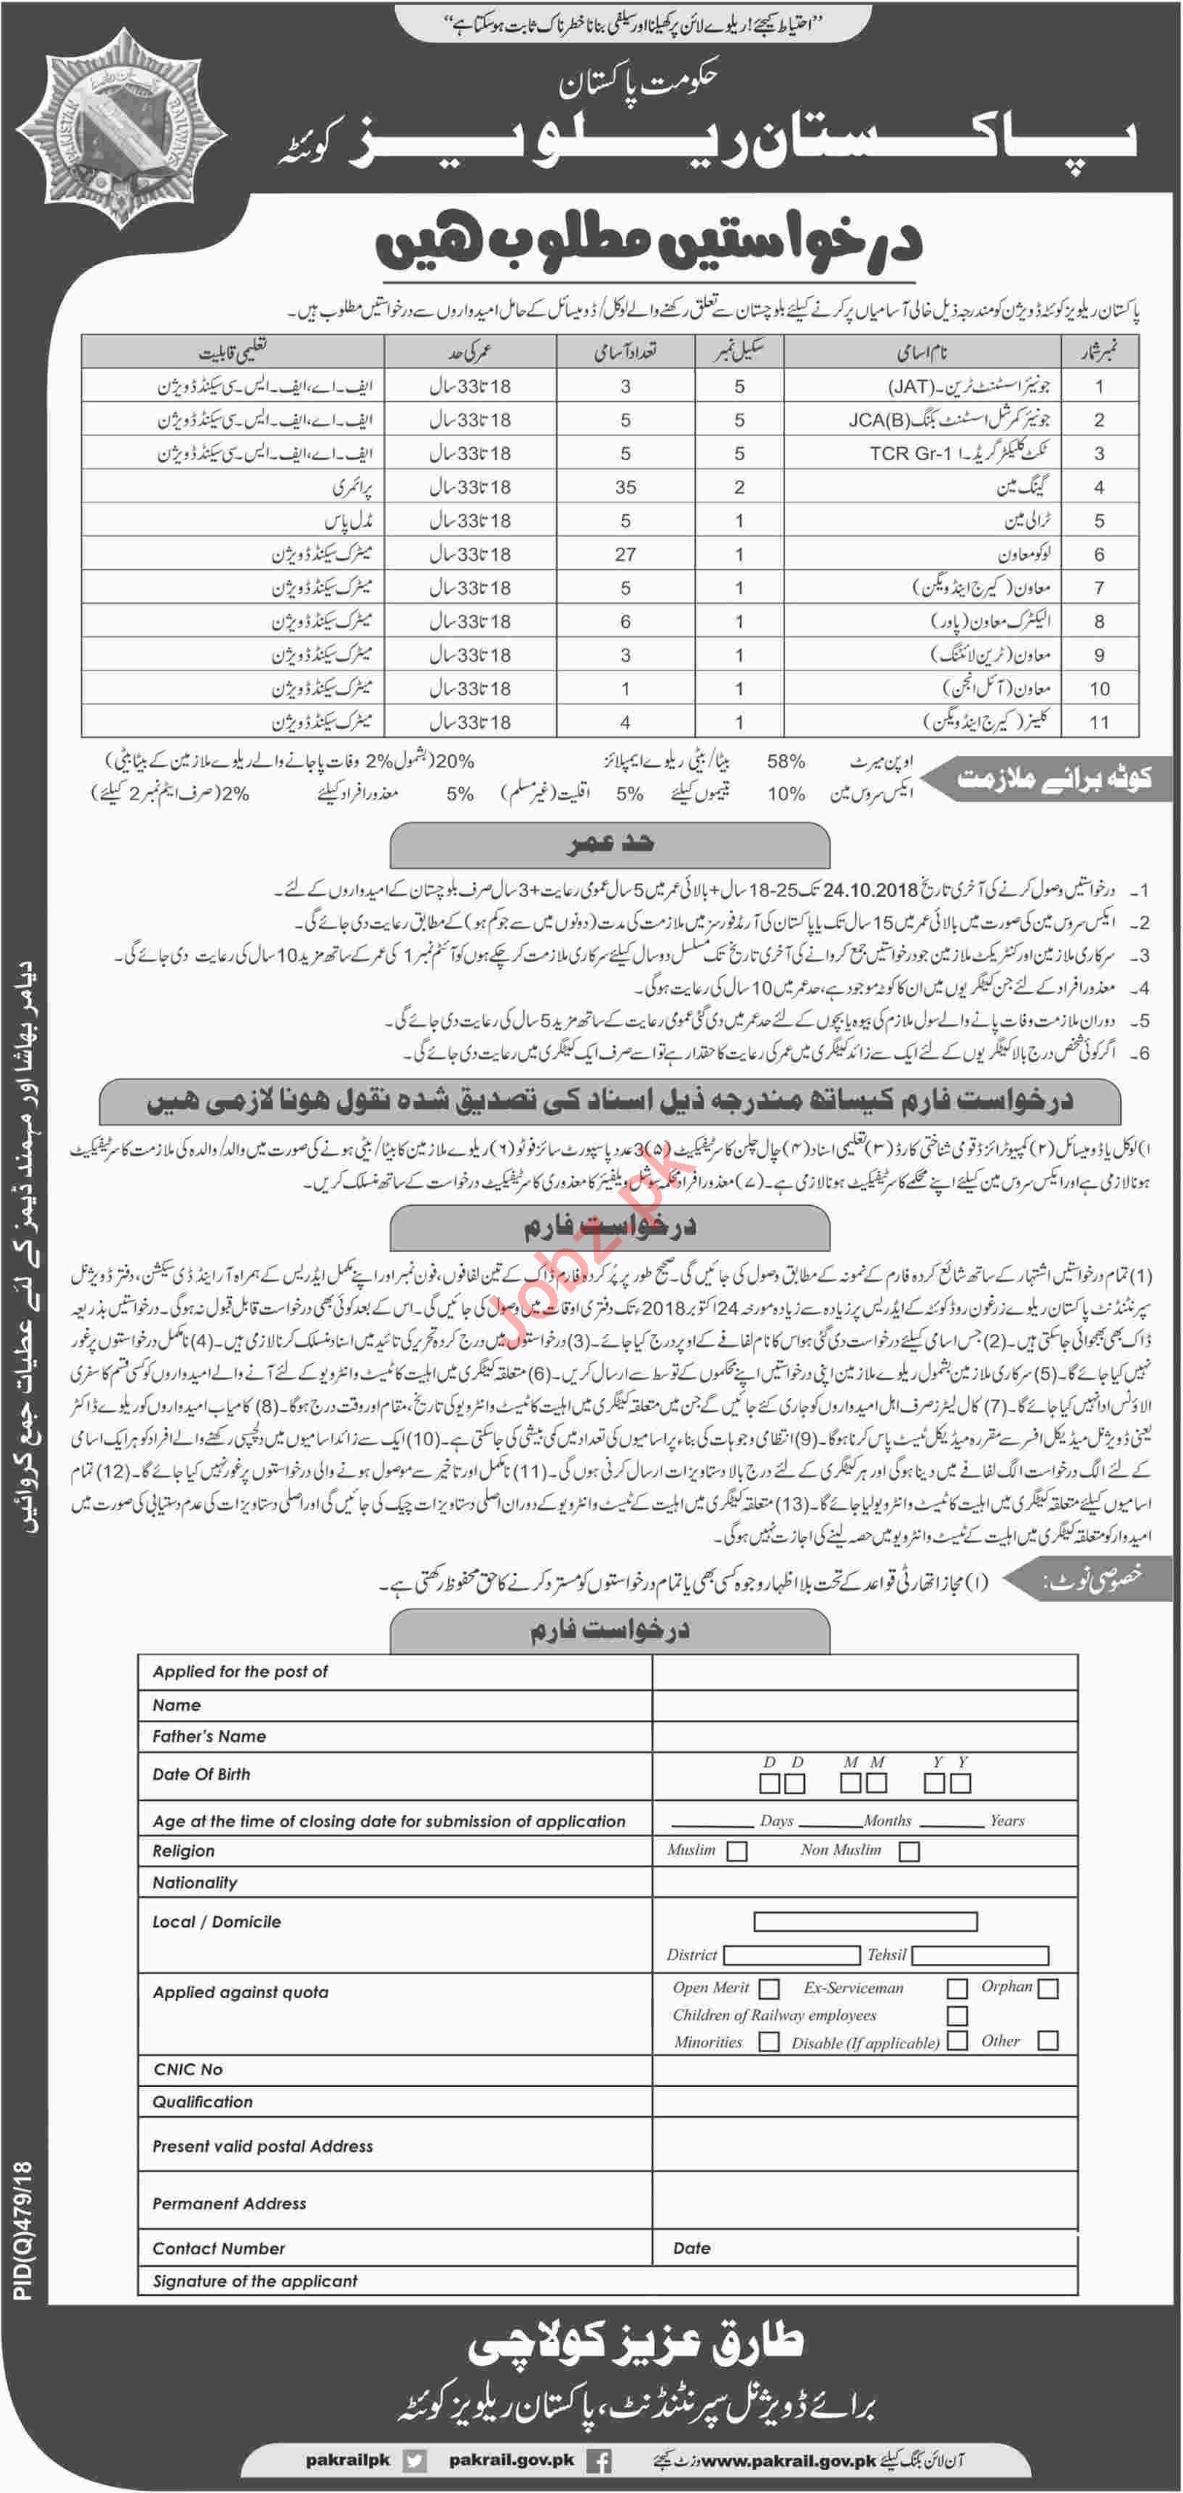 Pakistan Railways Jobs 2018 For Quetta Balochistan